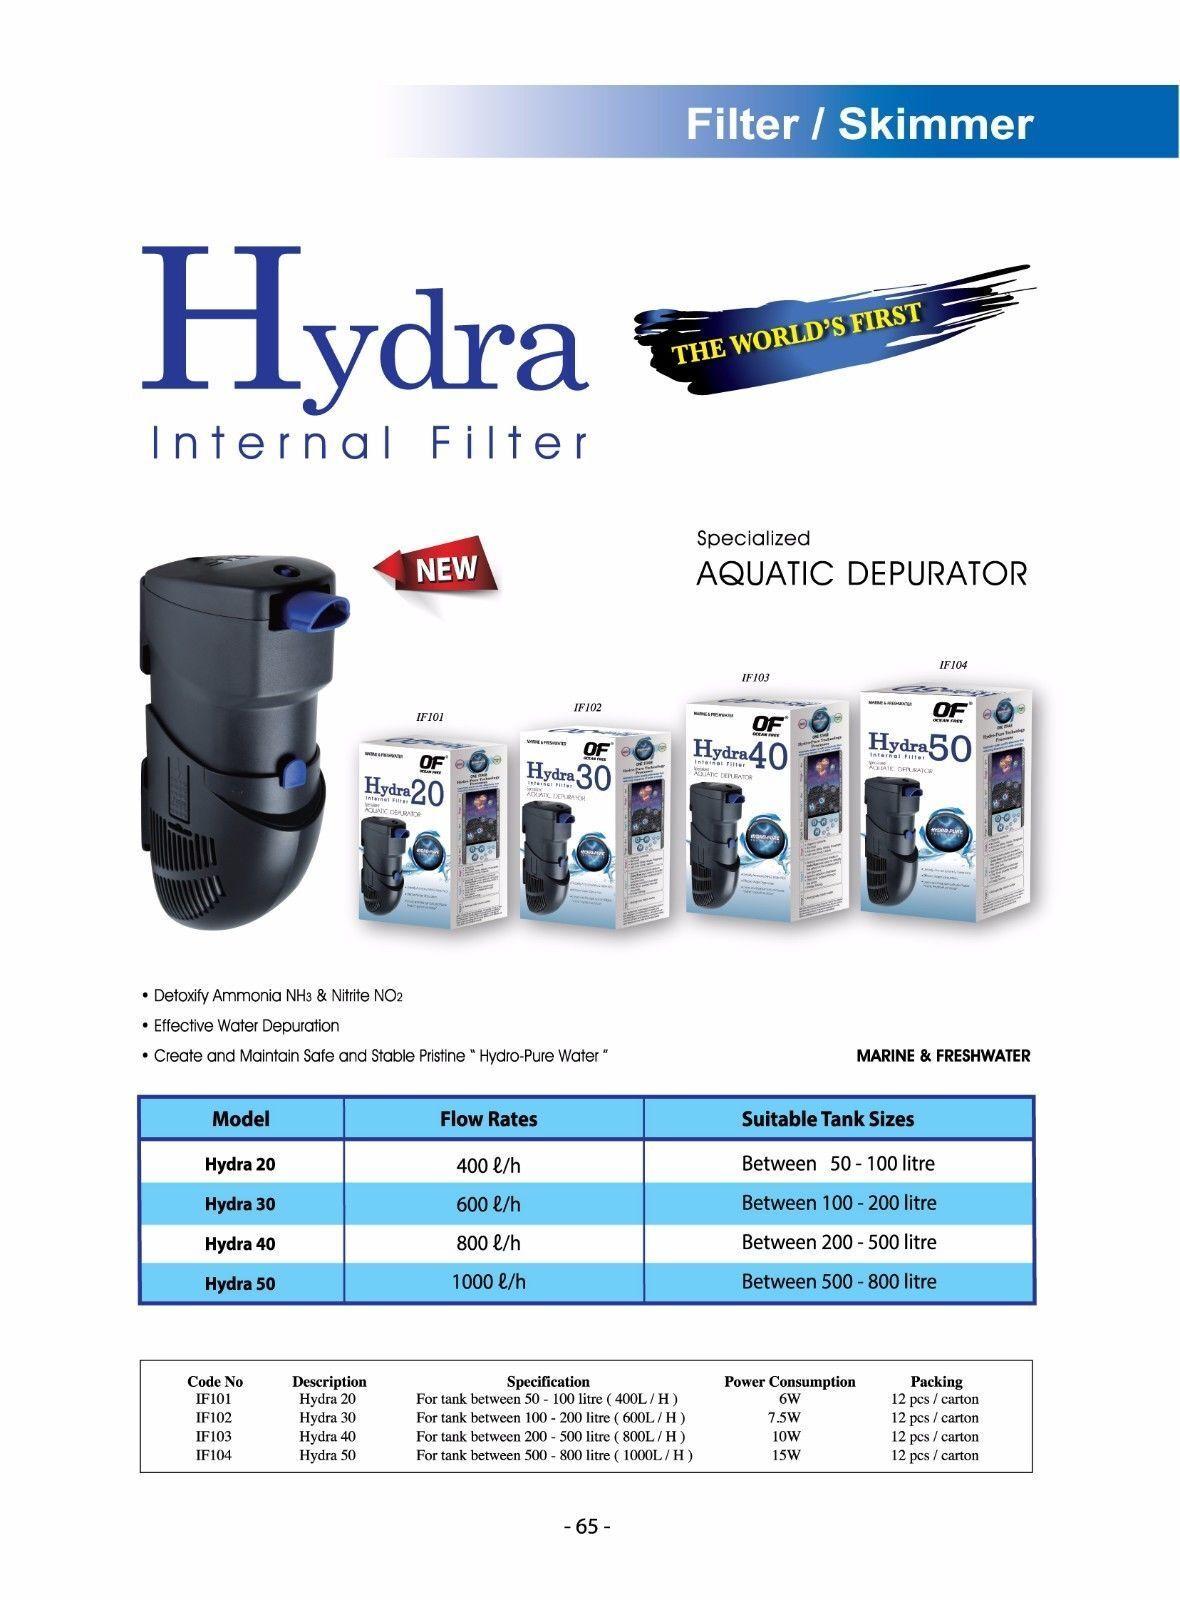 OF OCEAN FREE HYDRA 50 INTERNAL FILTER for 500-800 L (125- 200 Gallon) AQUARIUM